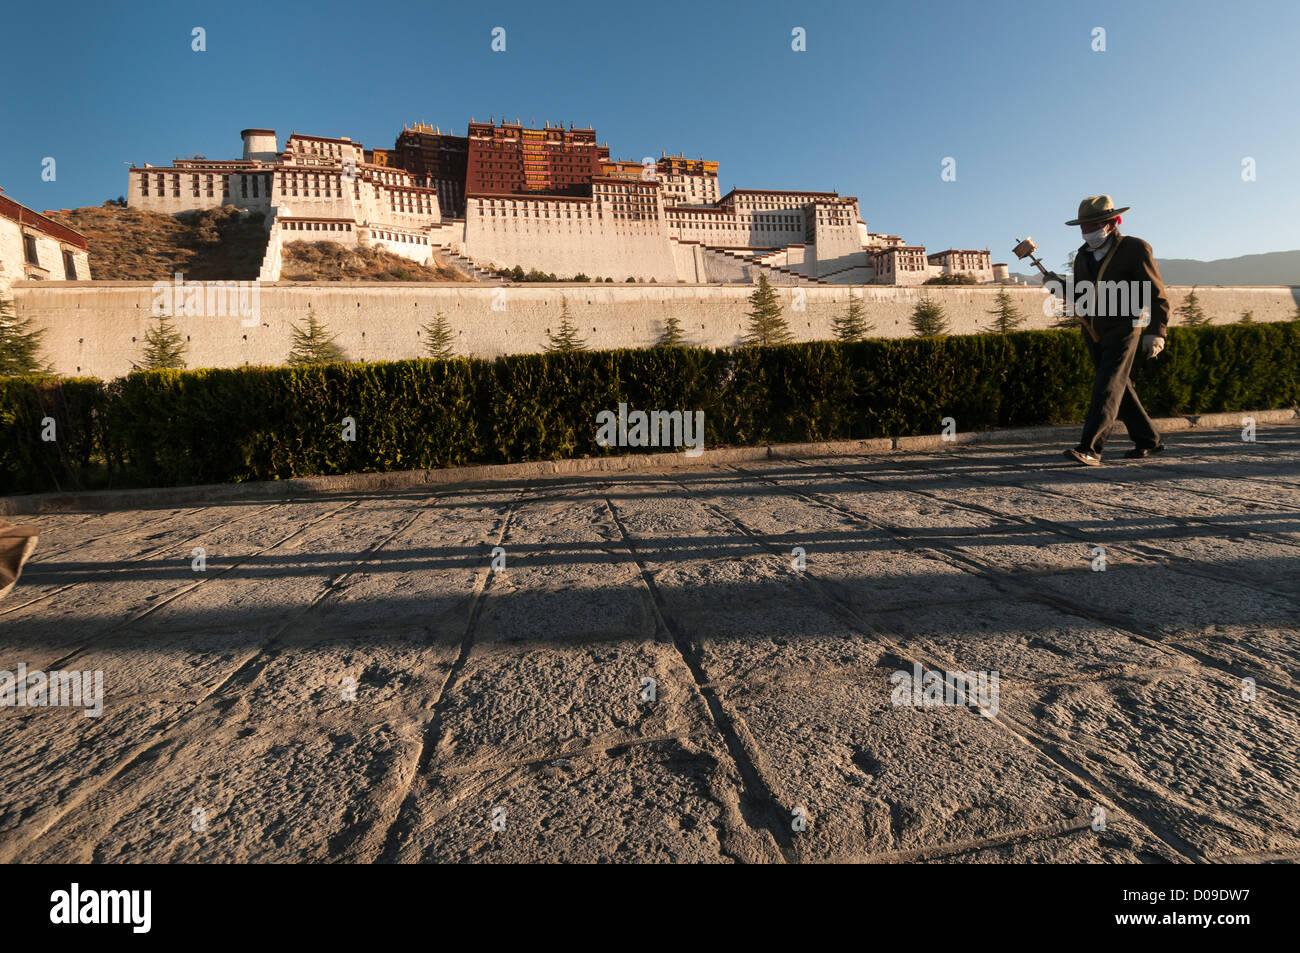 Tibetan Buddhist pilgrim carrying prayer wheel walks around Portala Palace at dawn, Lhasa, Tibet, China - Stock Image